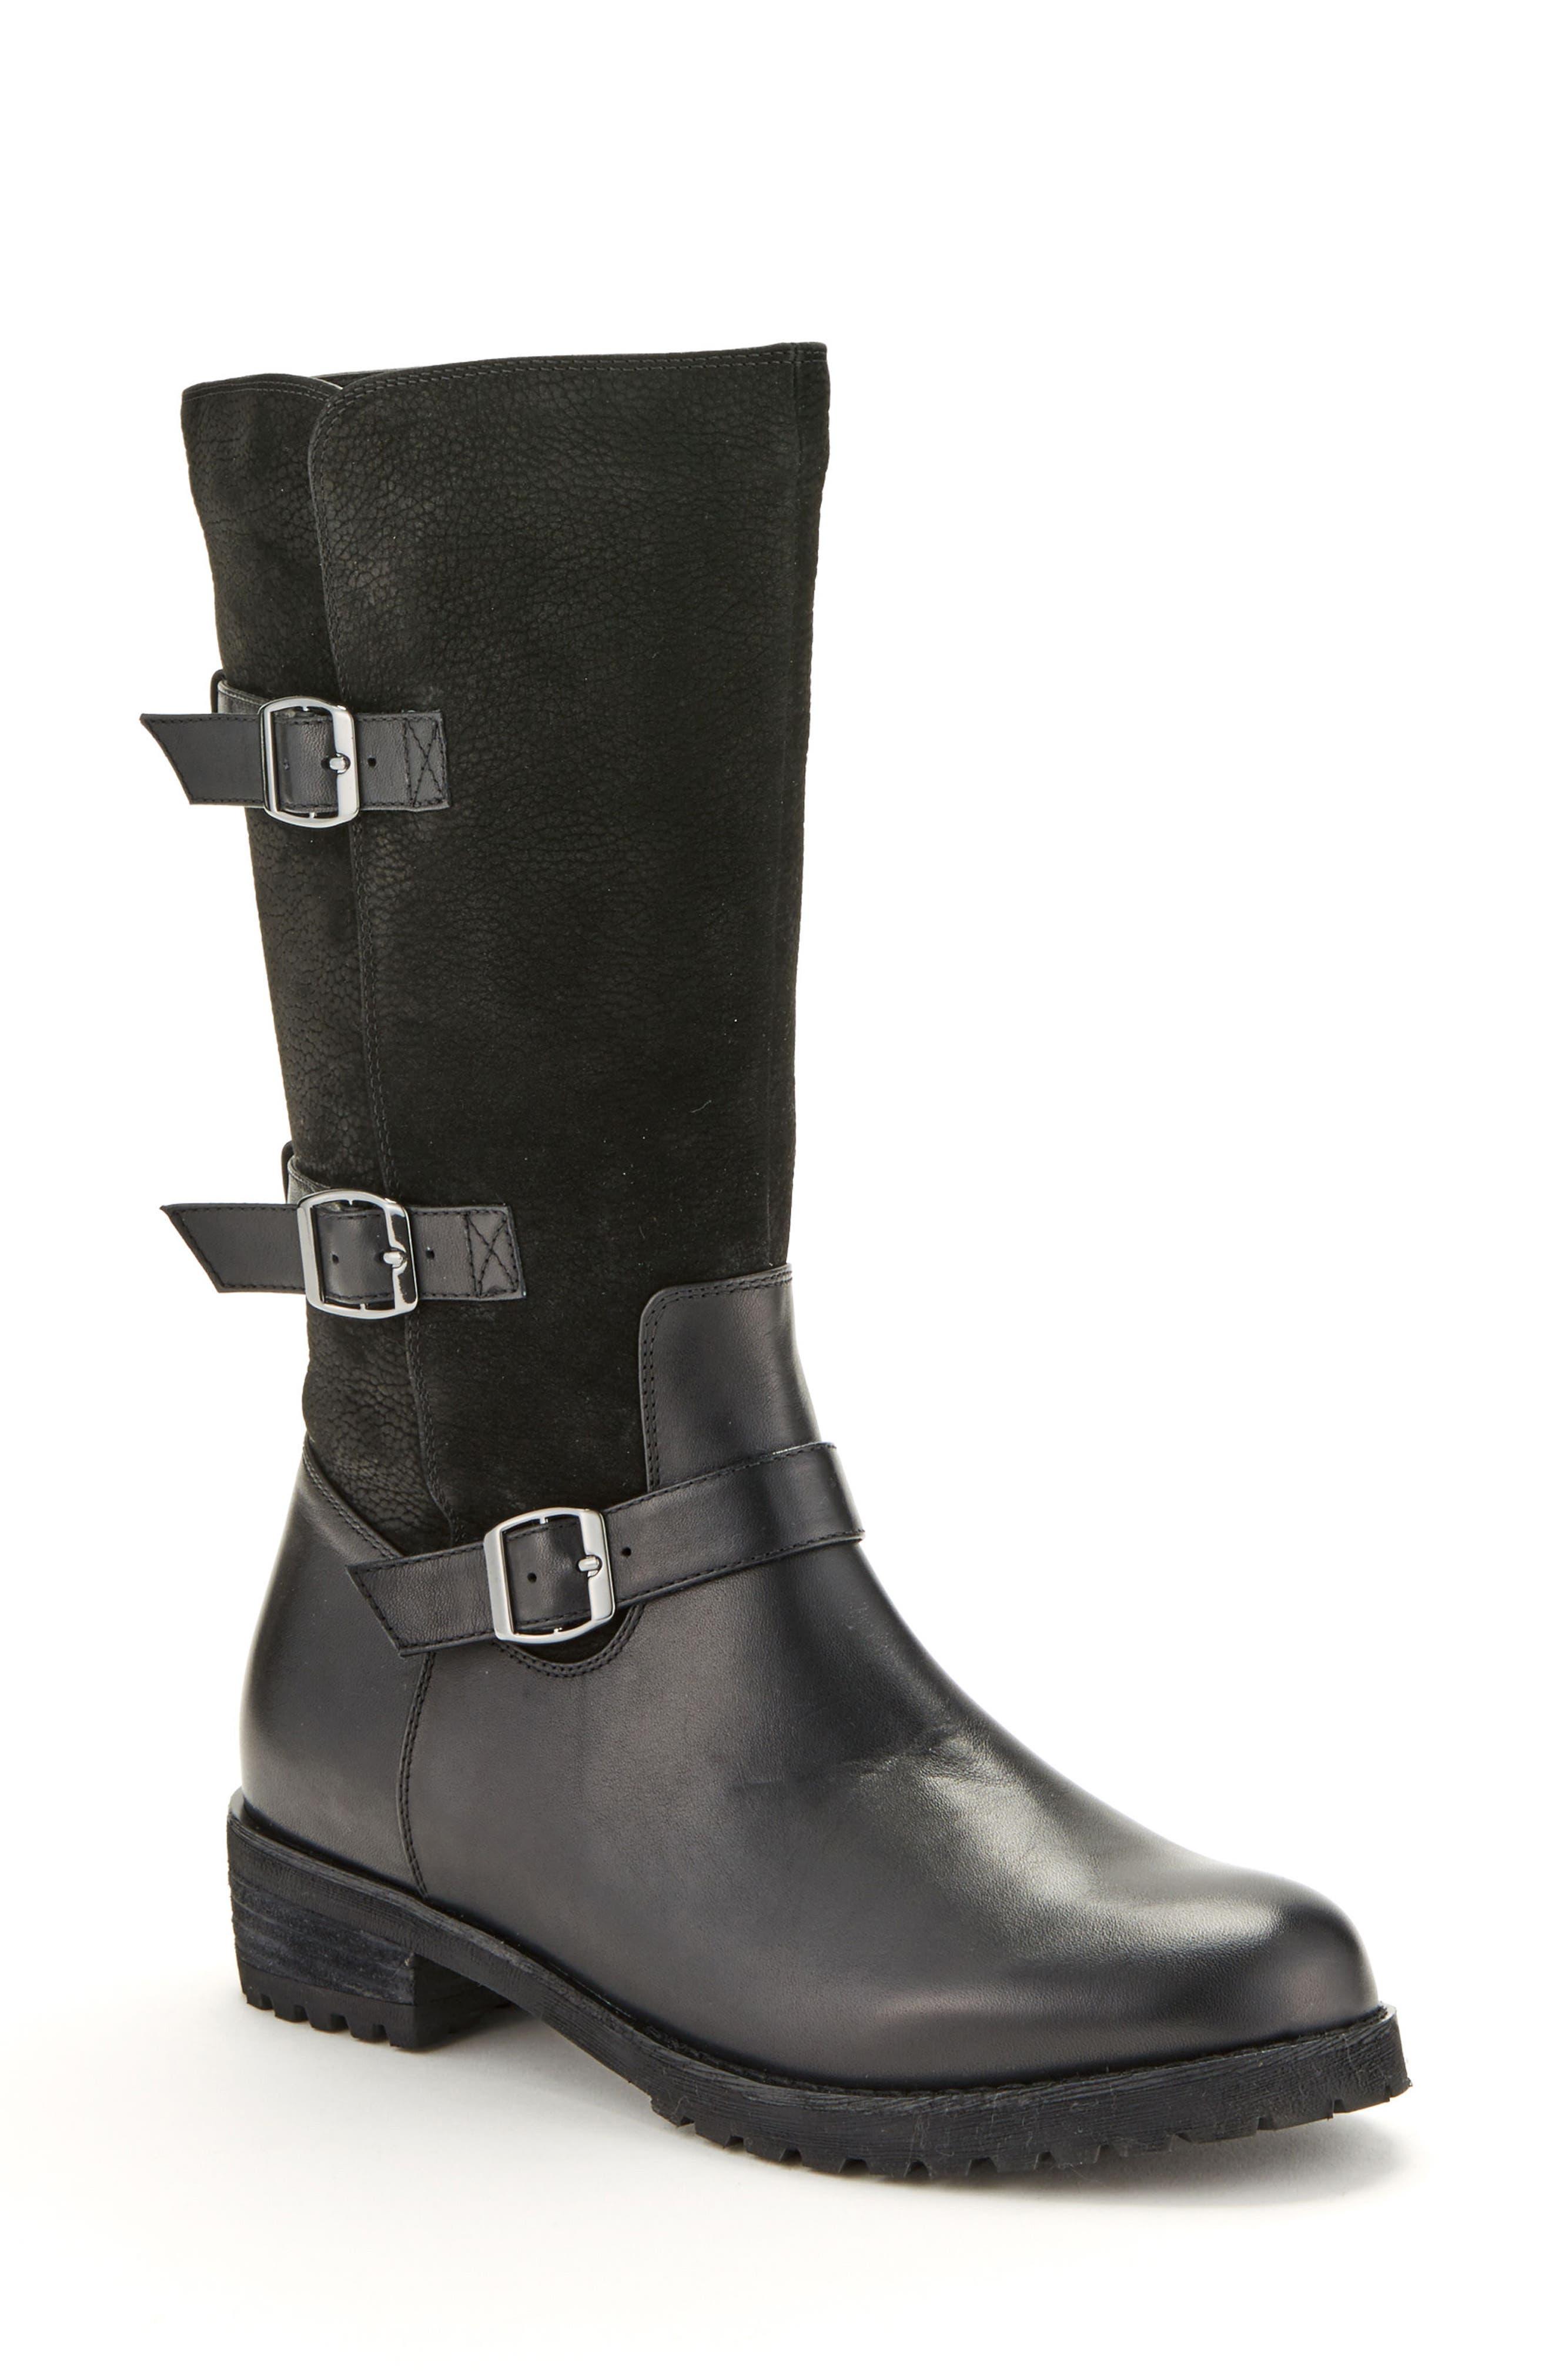 Blondo Lenie Waterproof Moto Boot- Black